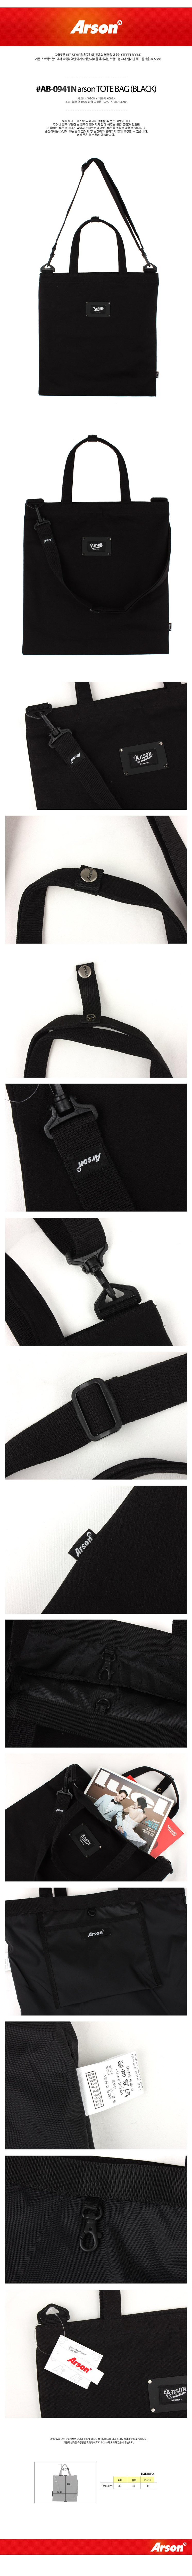 [ ARSON ] 纵火 AB-0941N 手提包(黑色)